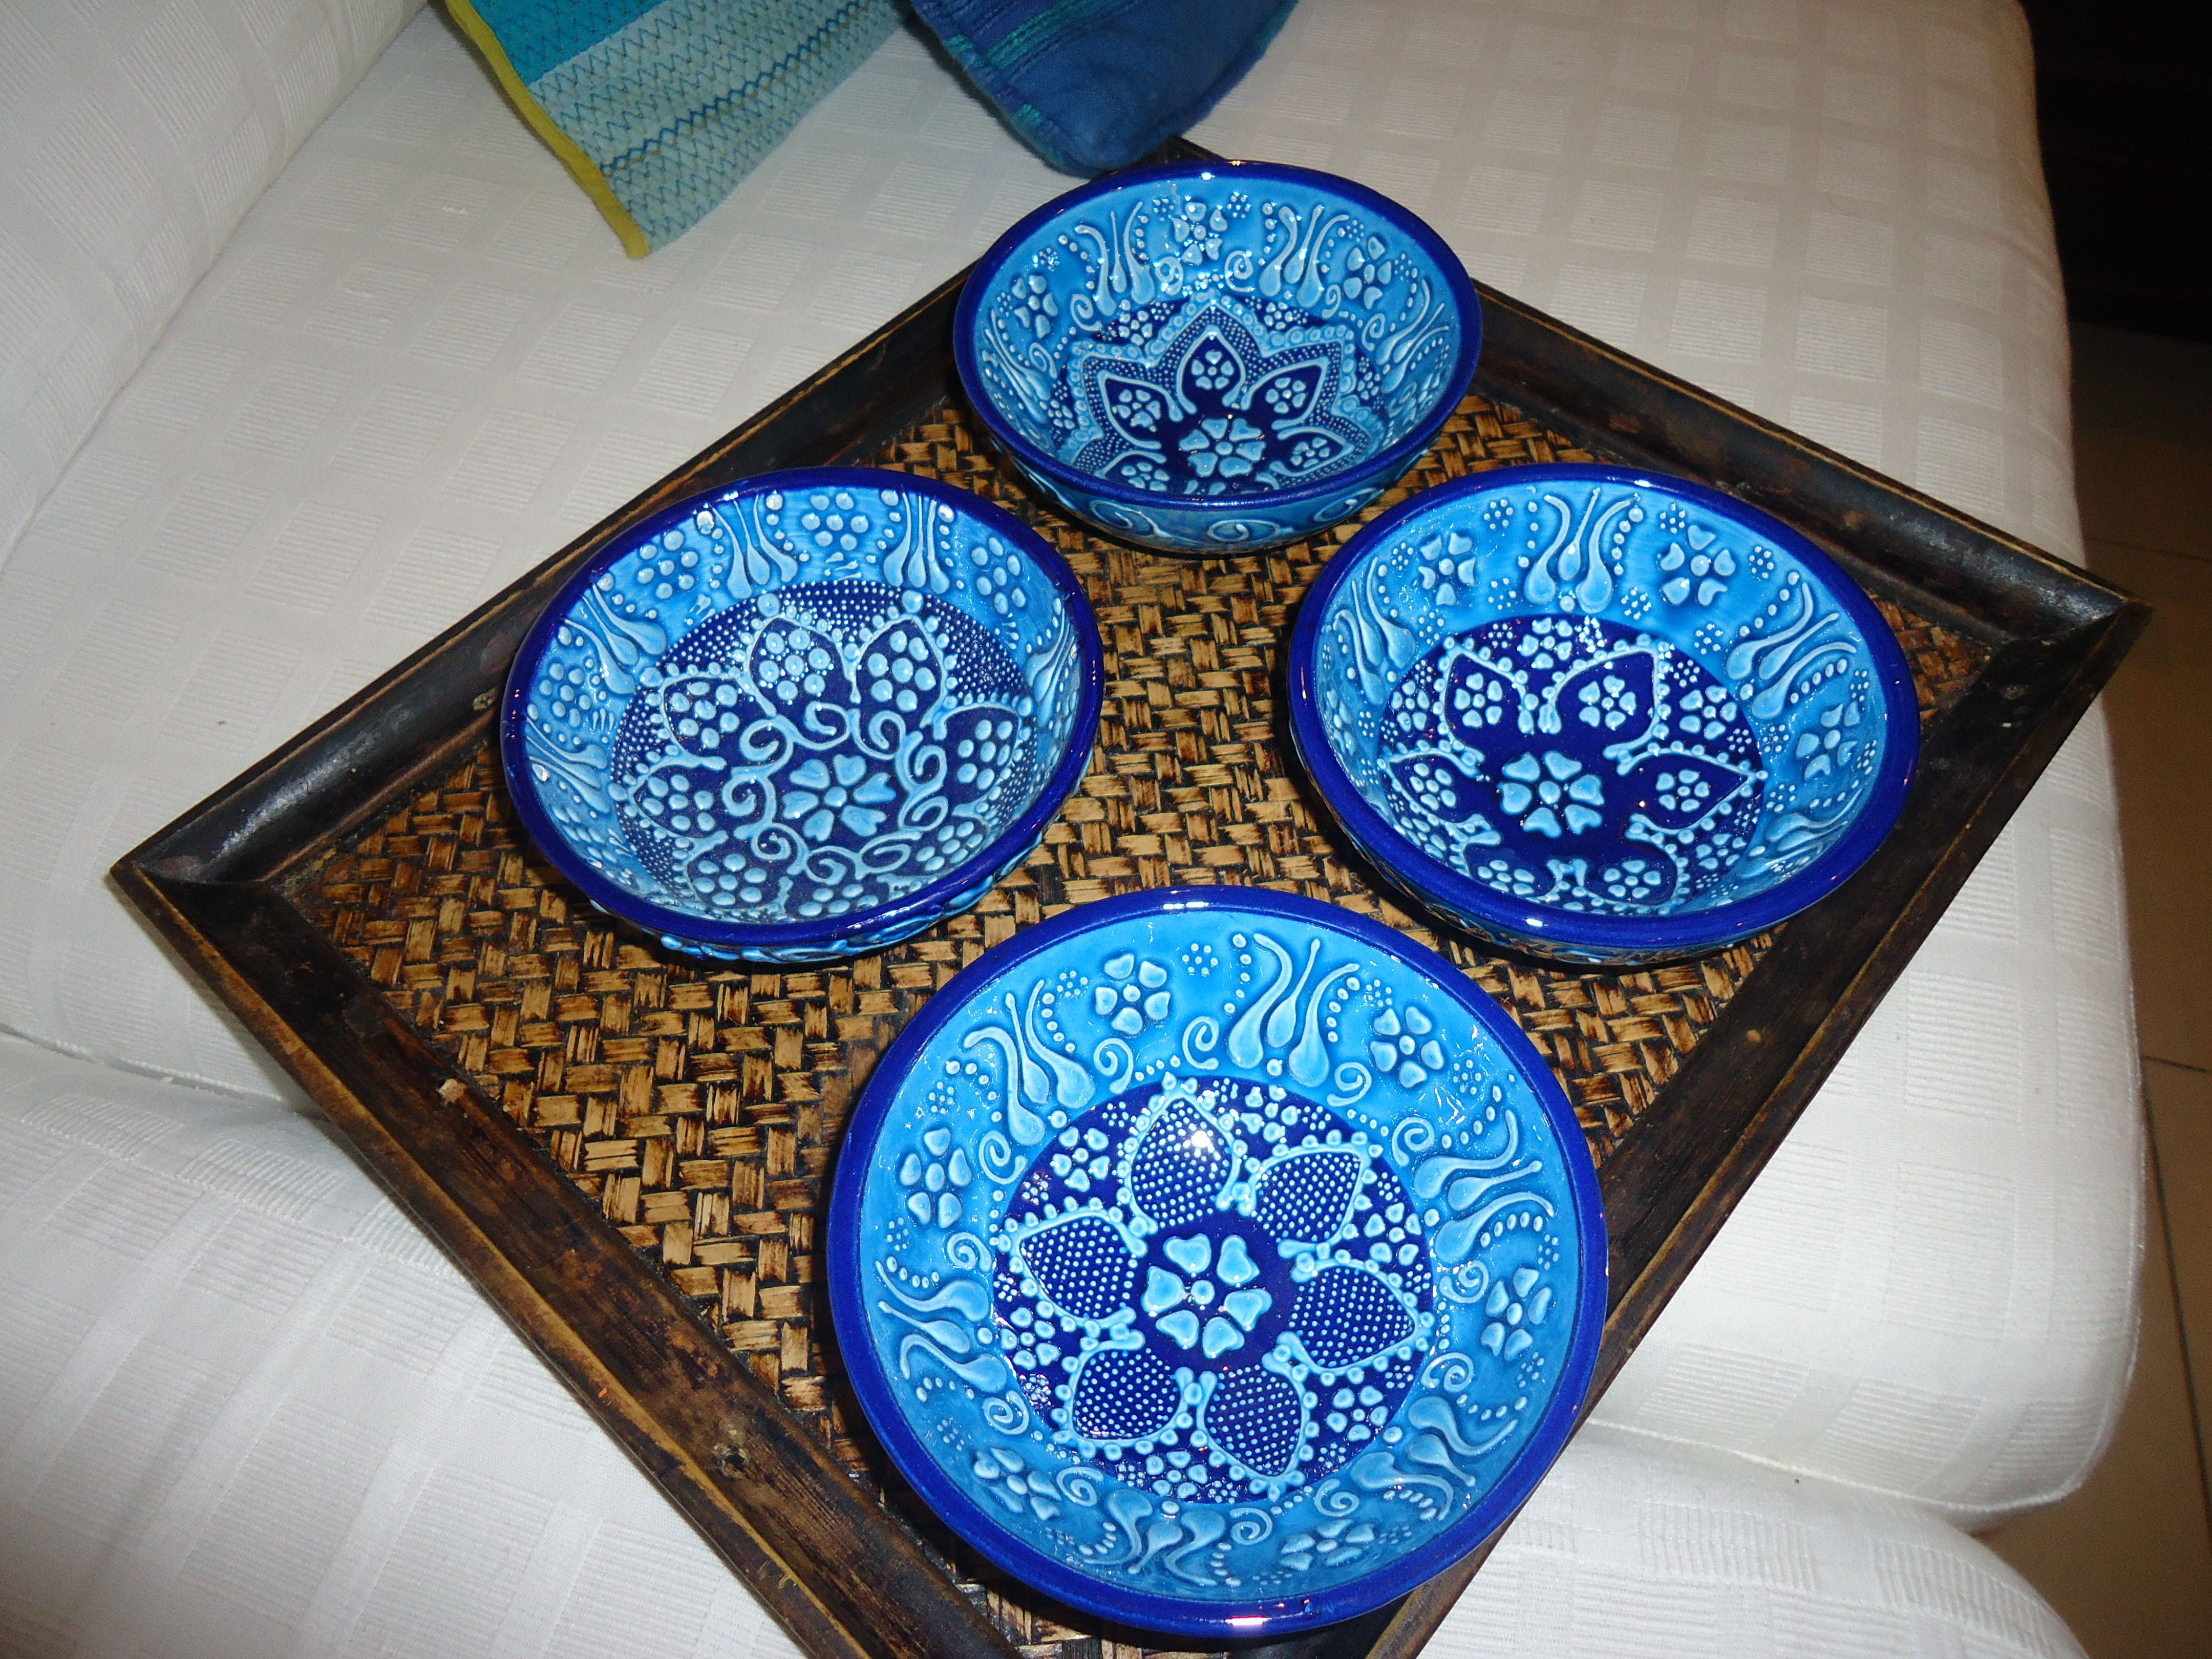 Blue turkish bowls china patterns decorative plates decor